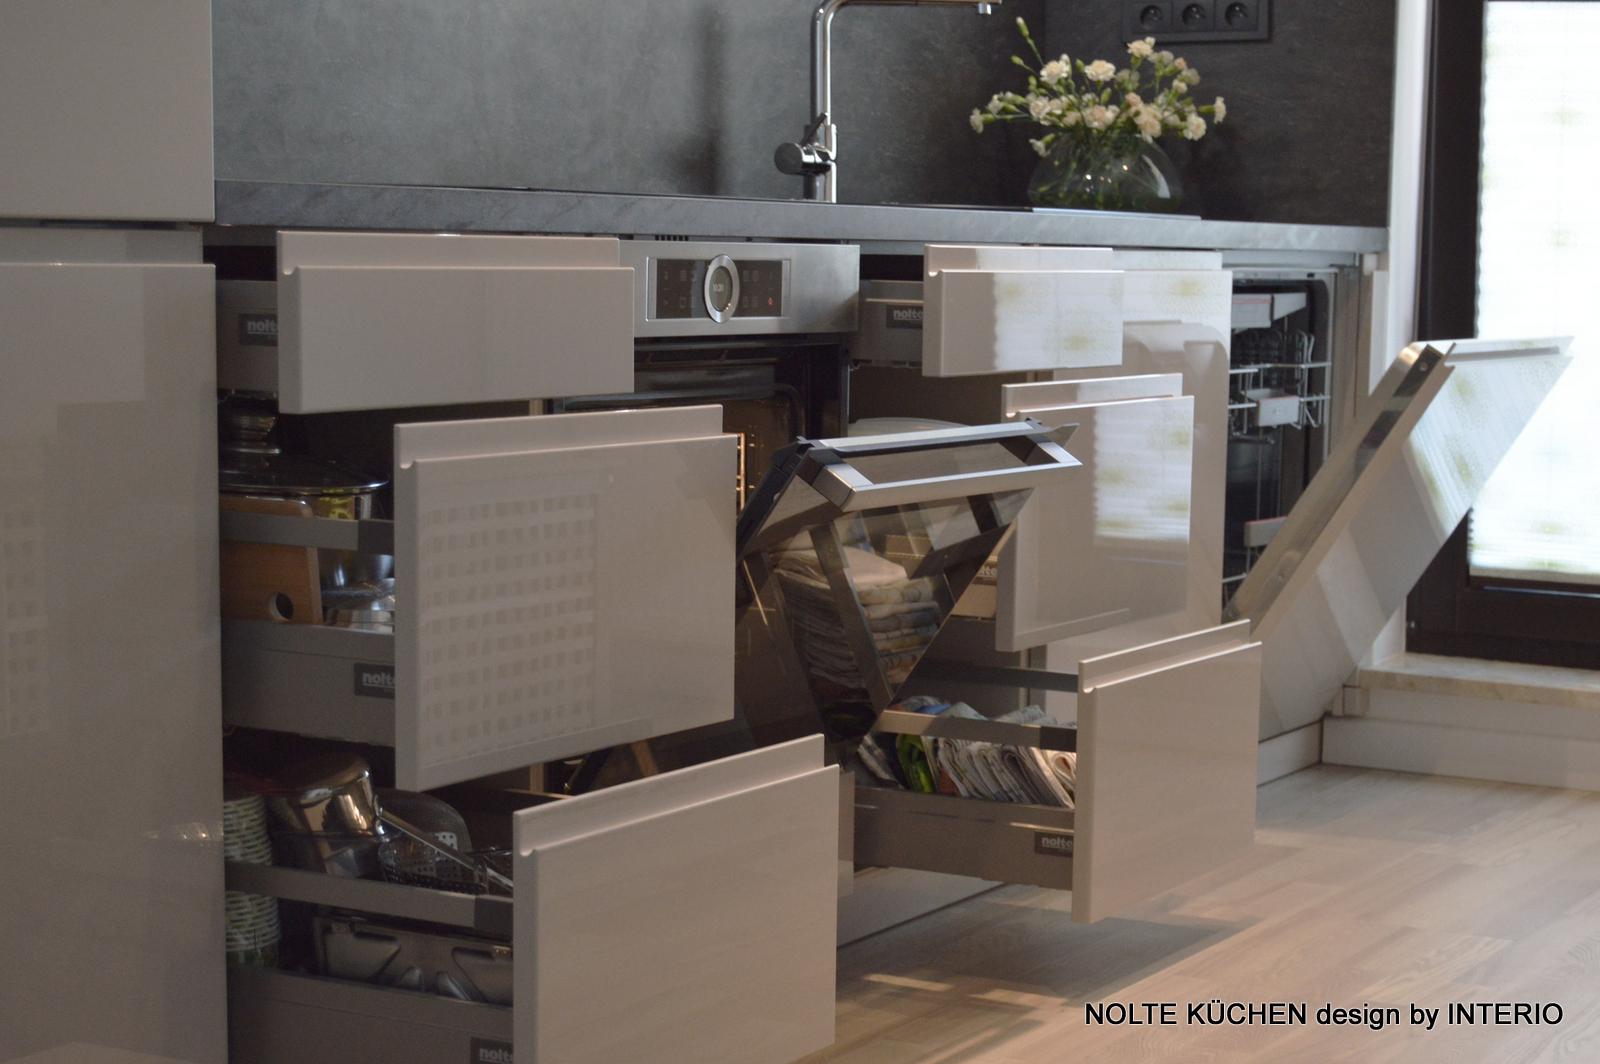 Prosta Kuchnia We Wnece 3 5m Kuchnie Nolte Salony Interio